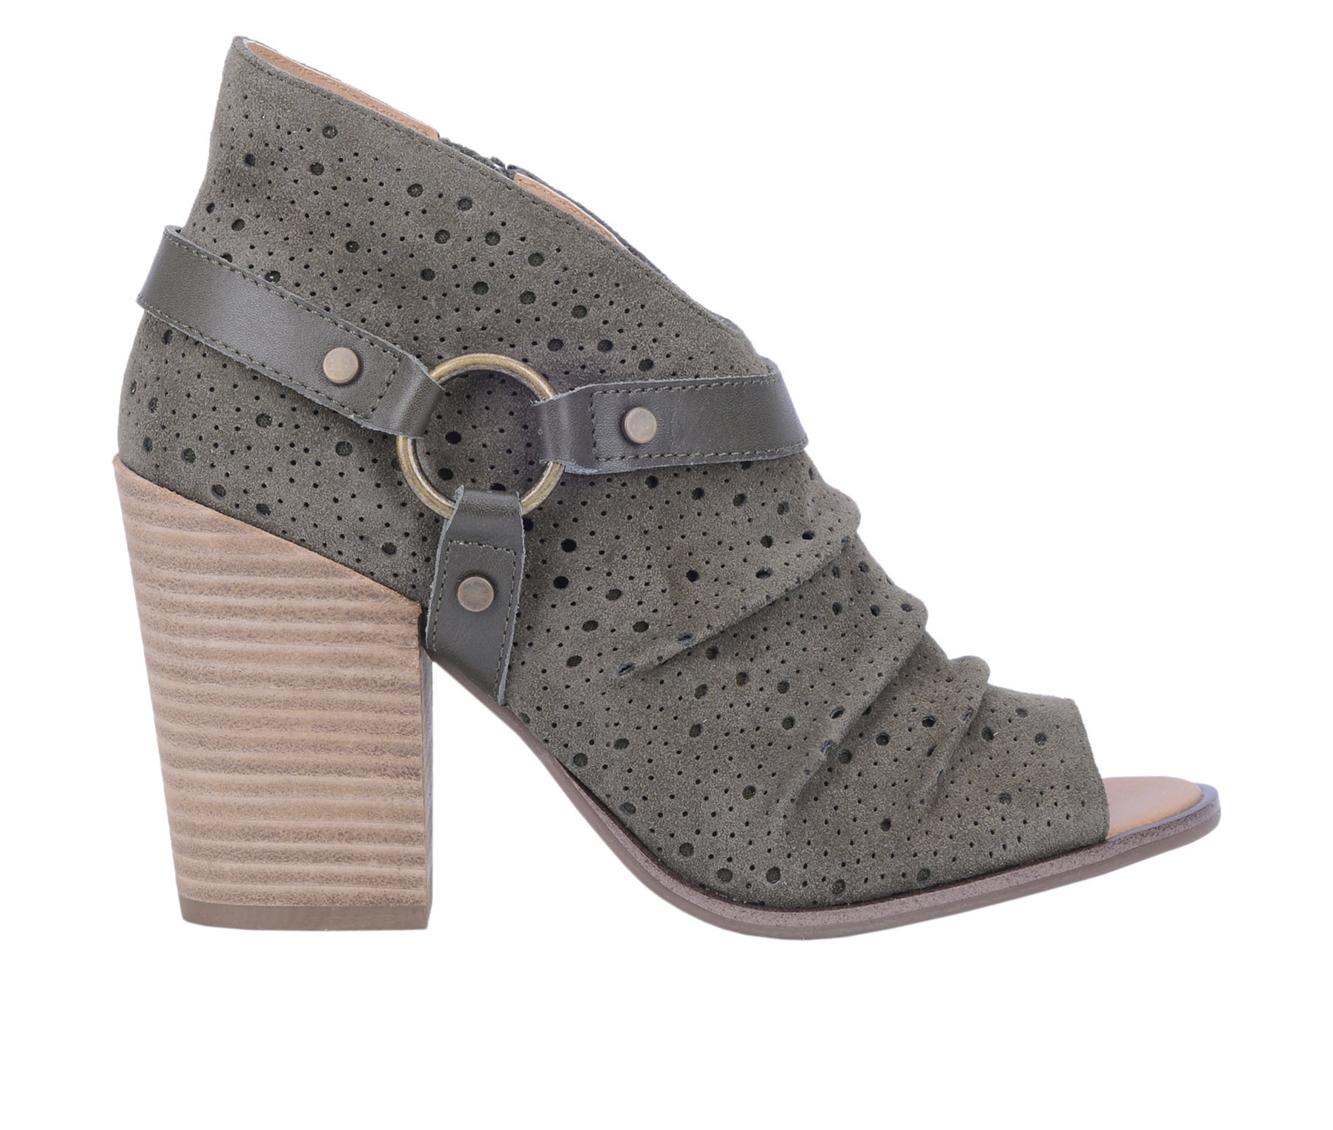 Dingo Boots Spurs Women's Dress Shoe (Green - Leather)